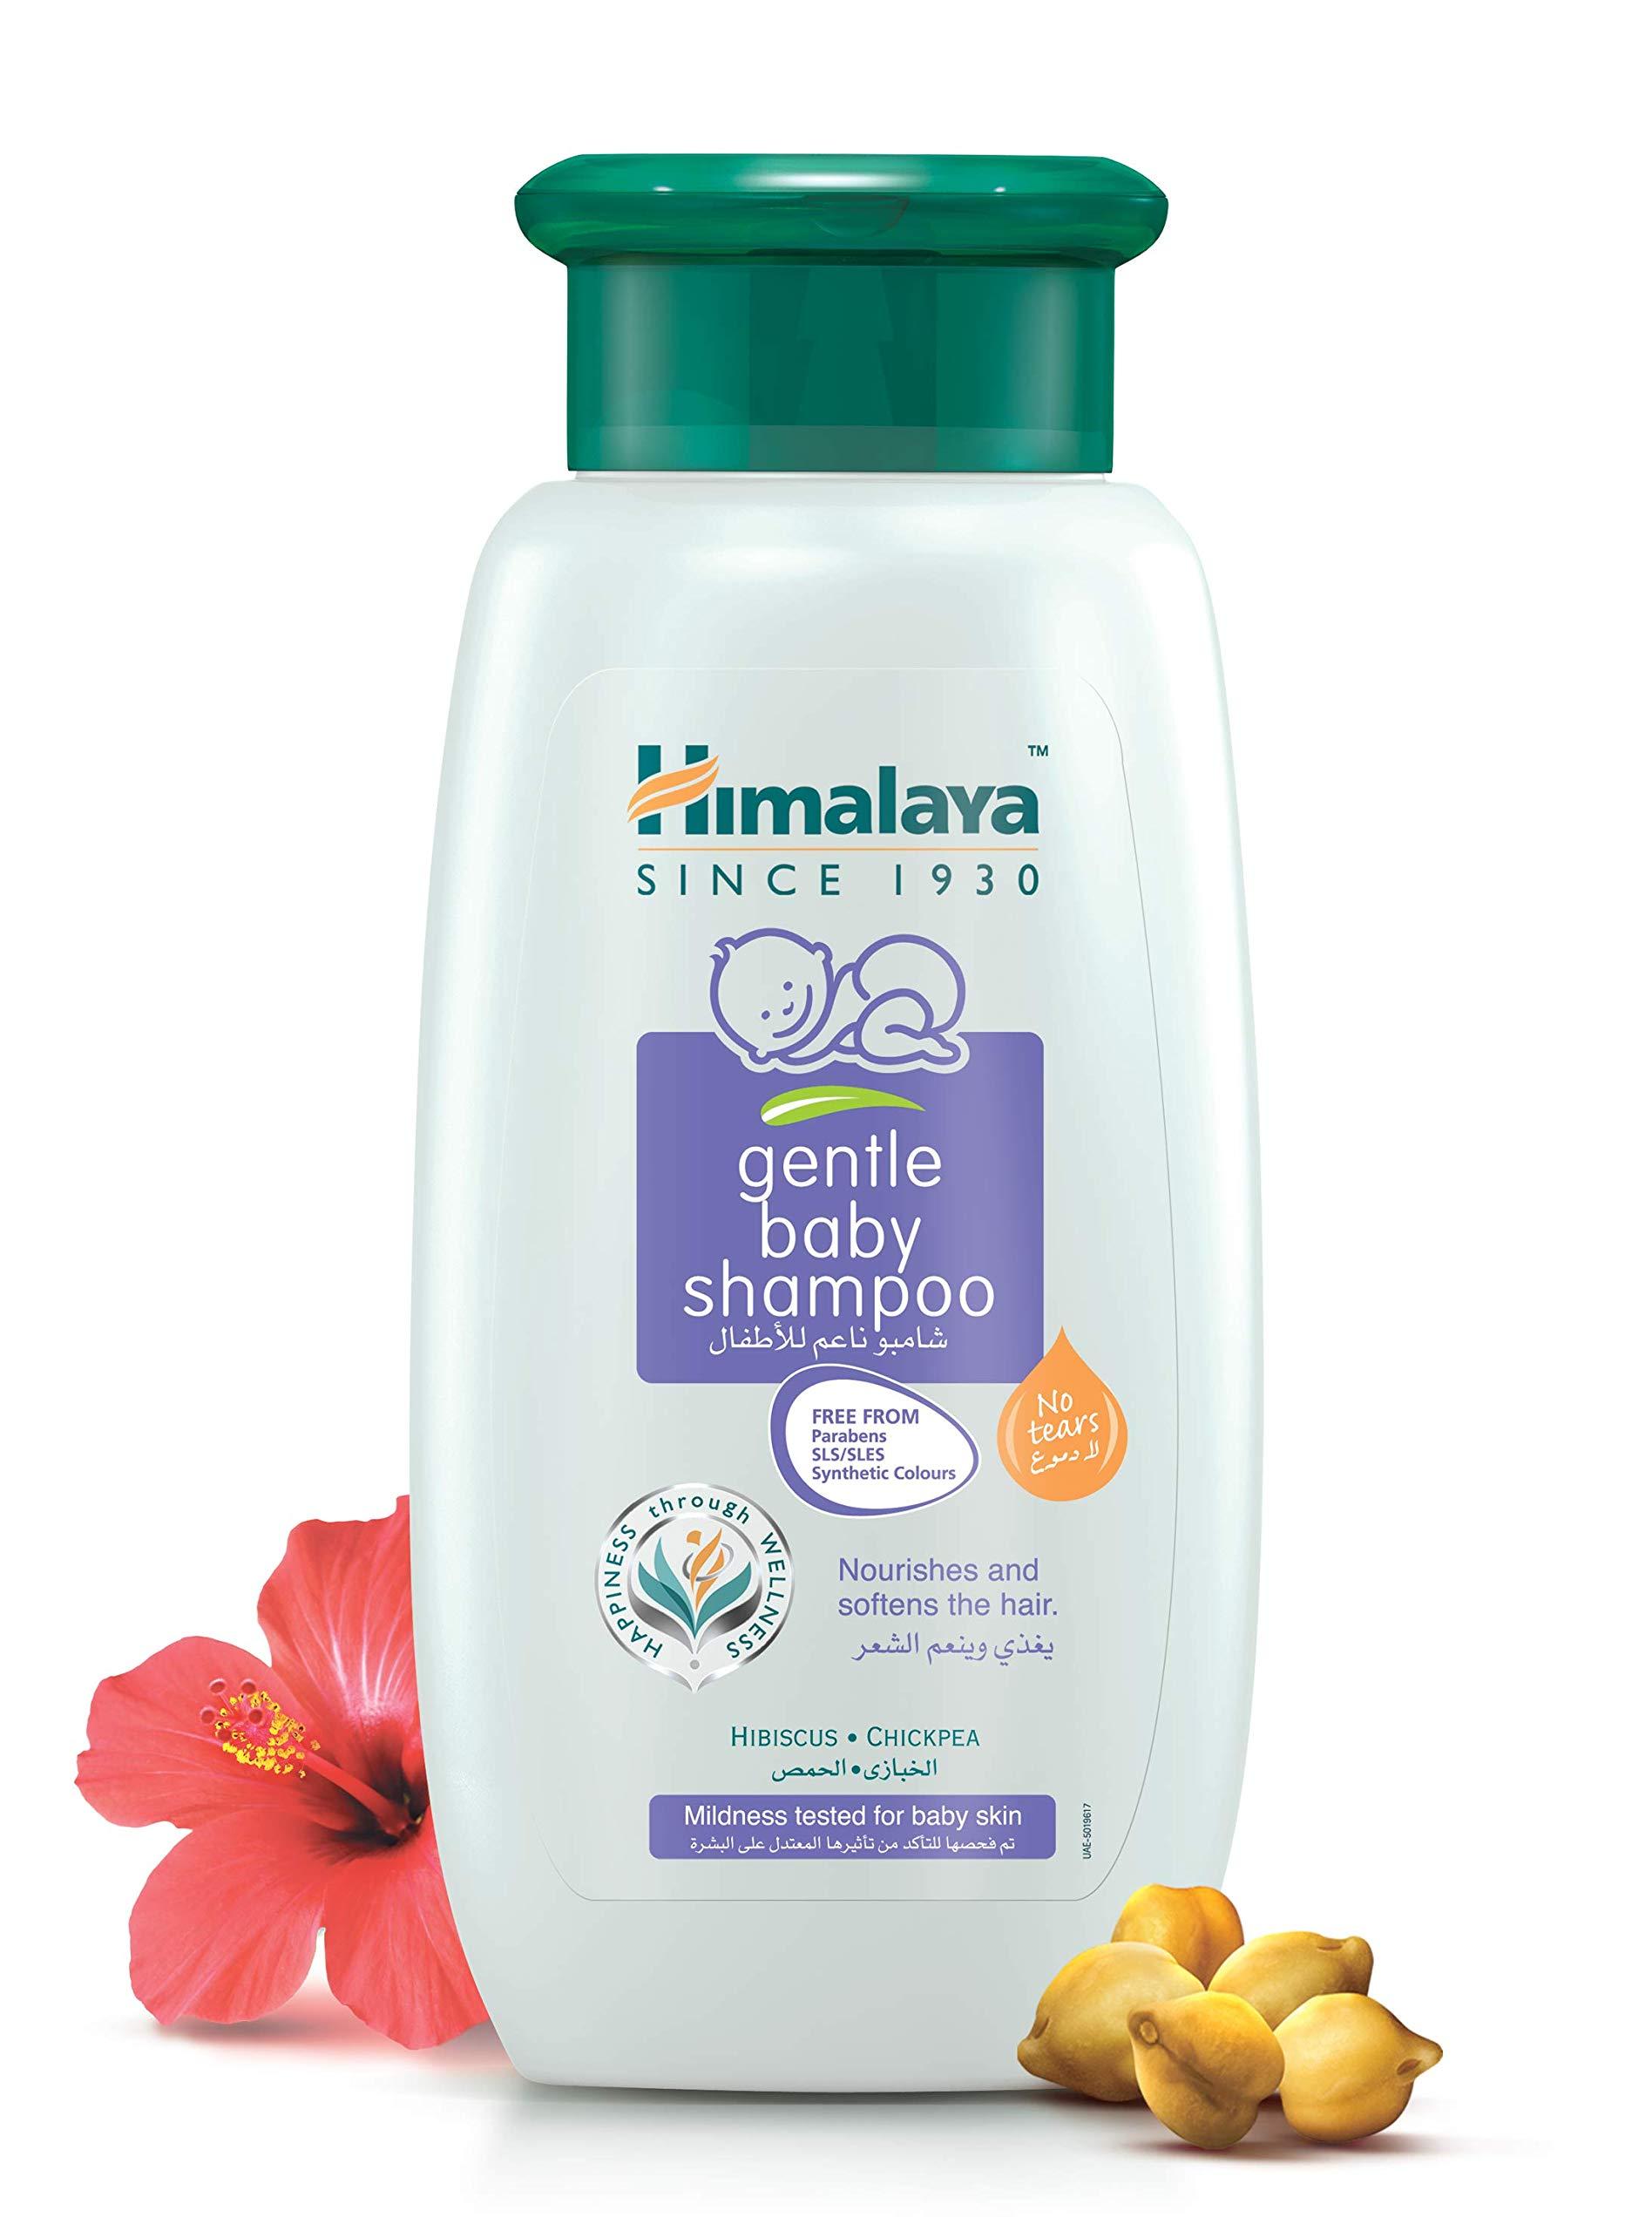 Himalaya Herbals Baby Shampoo price in UAE   Amazon ae UAE